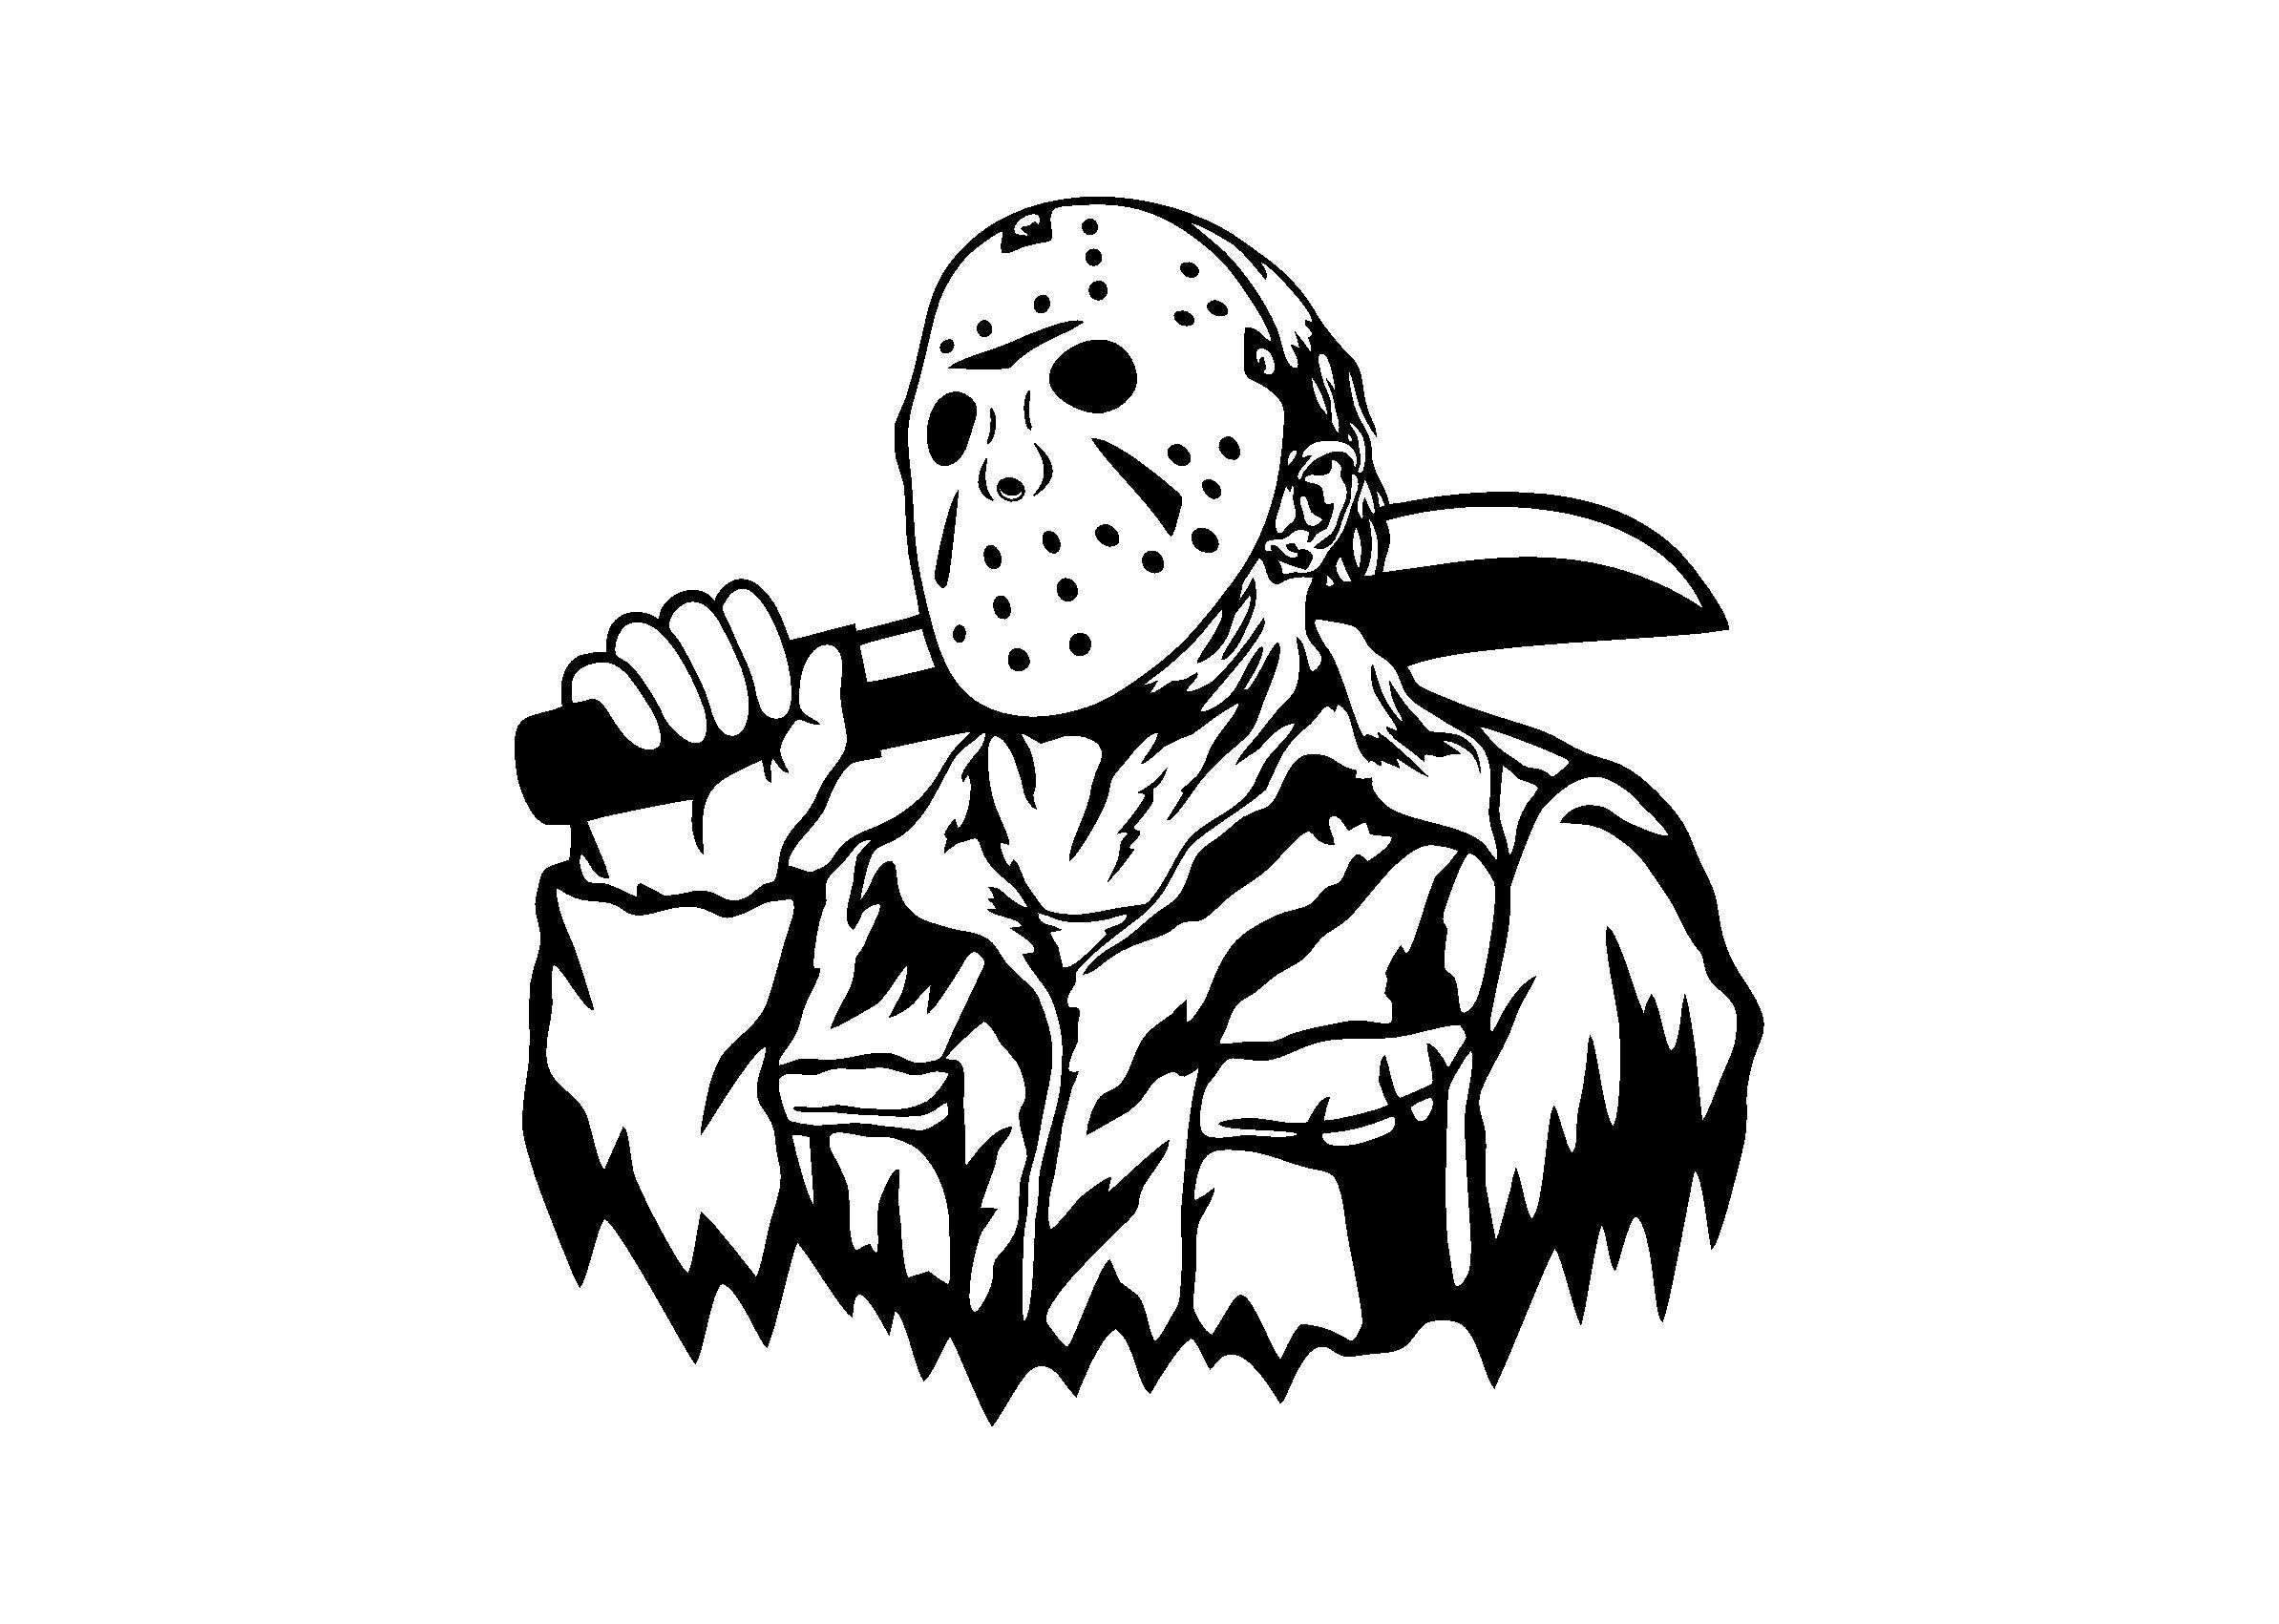 Jason Voorhees Svg Friday The 13th Svg Jason Voorhees Png Etsy In 2021 Horror Art Jason Voorhees Horror